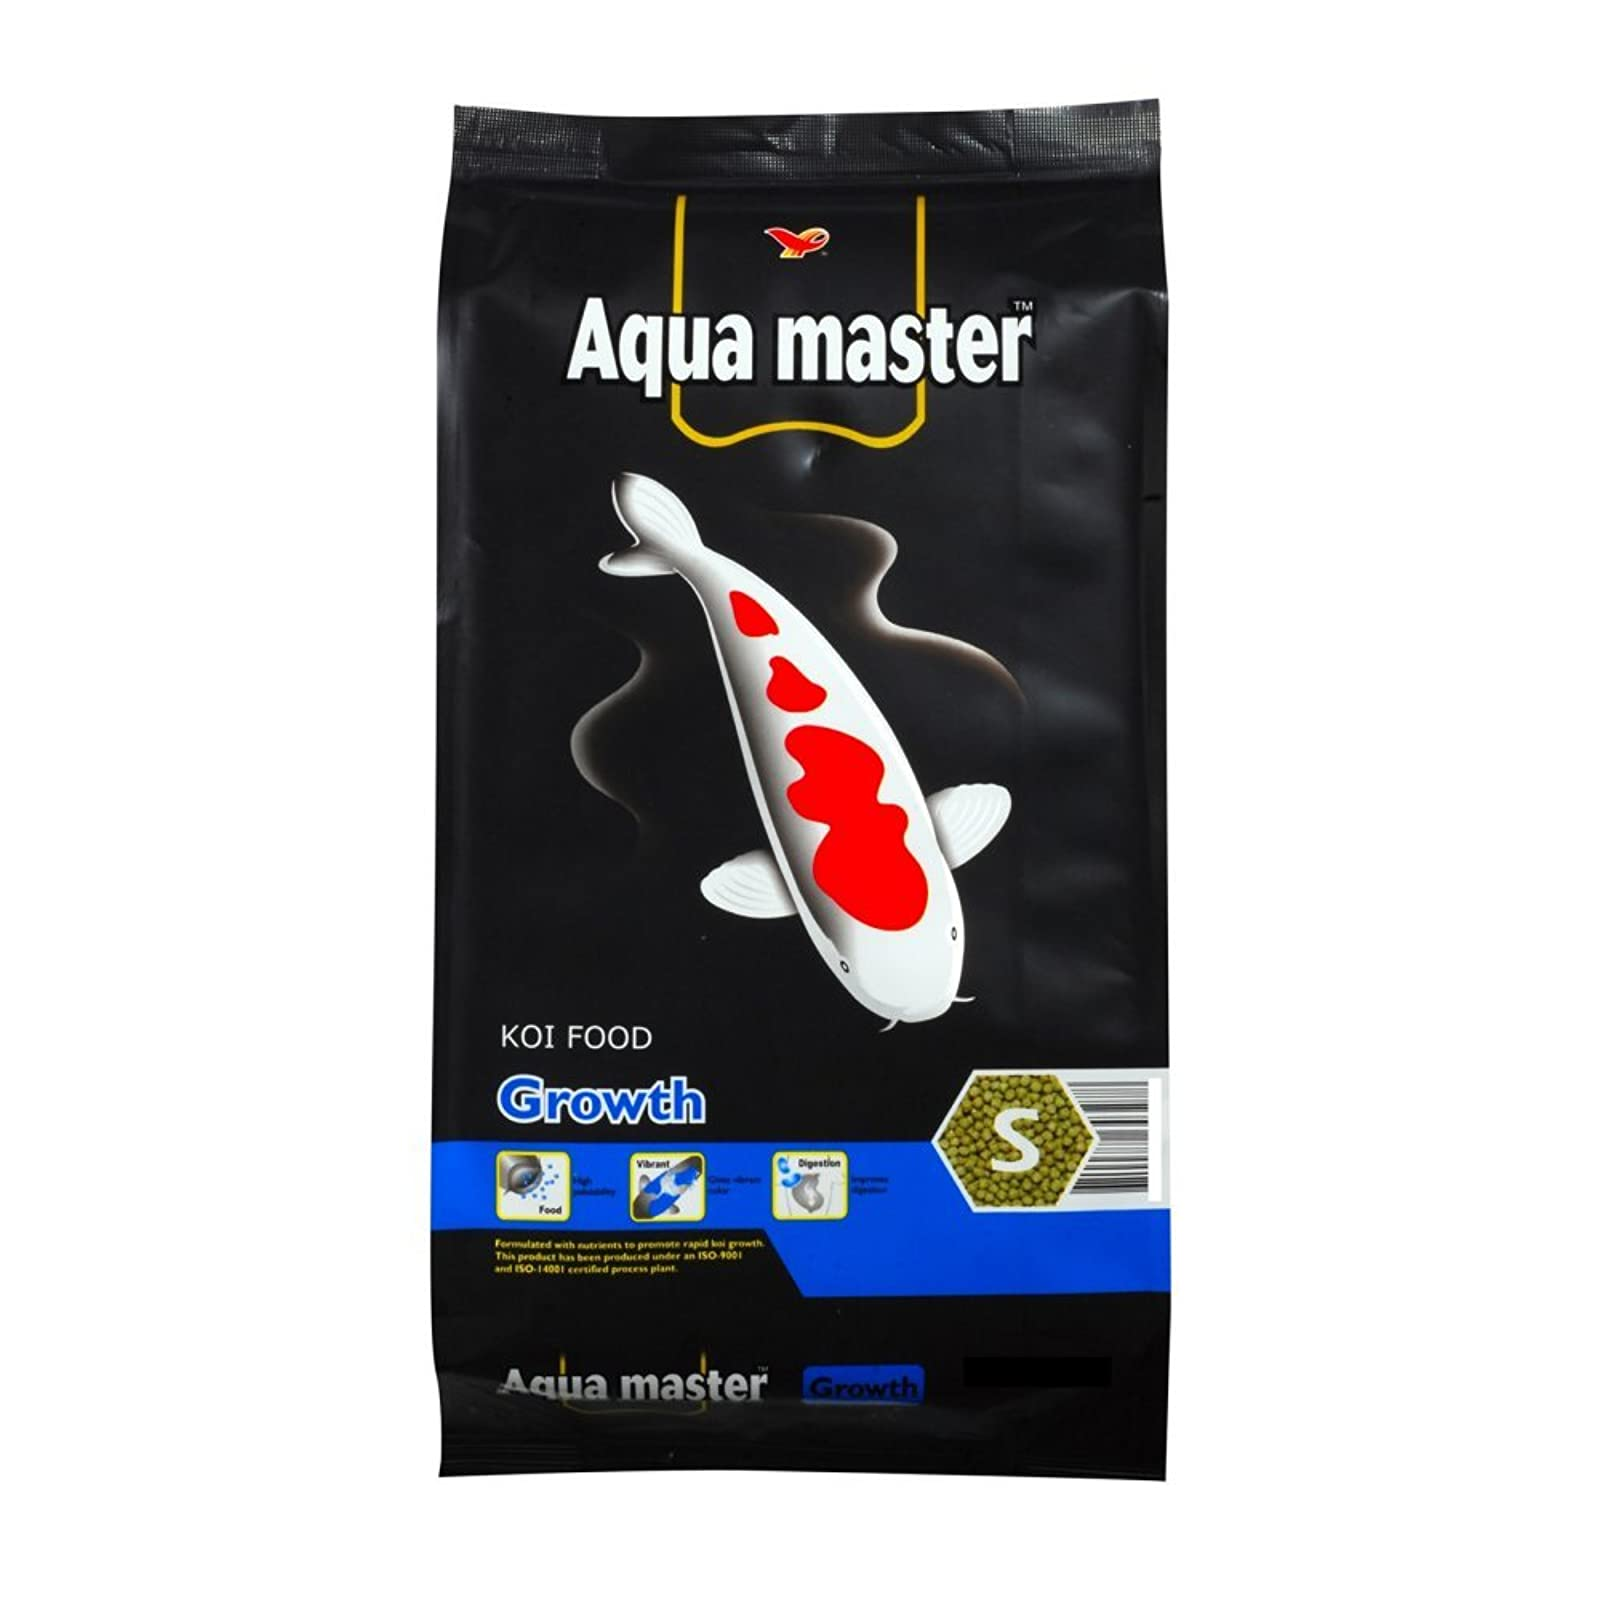 Aqua Master Growth Fish Food 22-Pound/Bag Small Growth 22 - 1